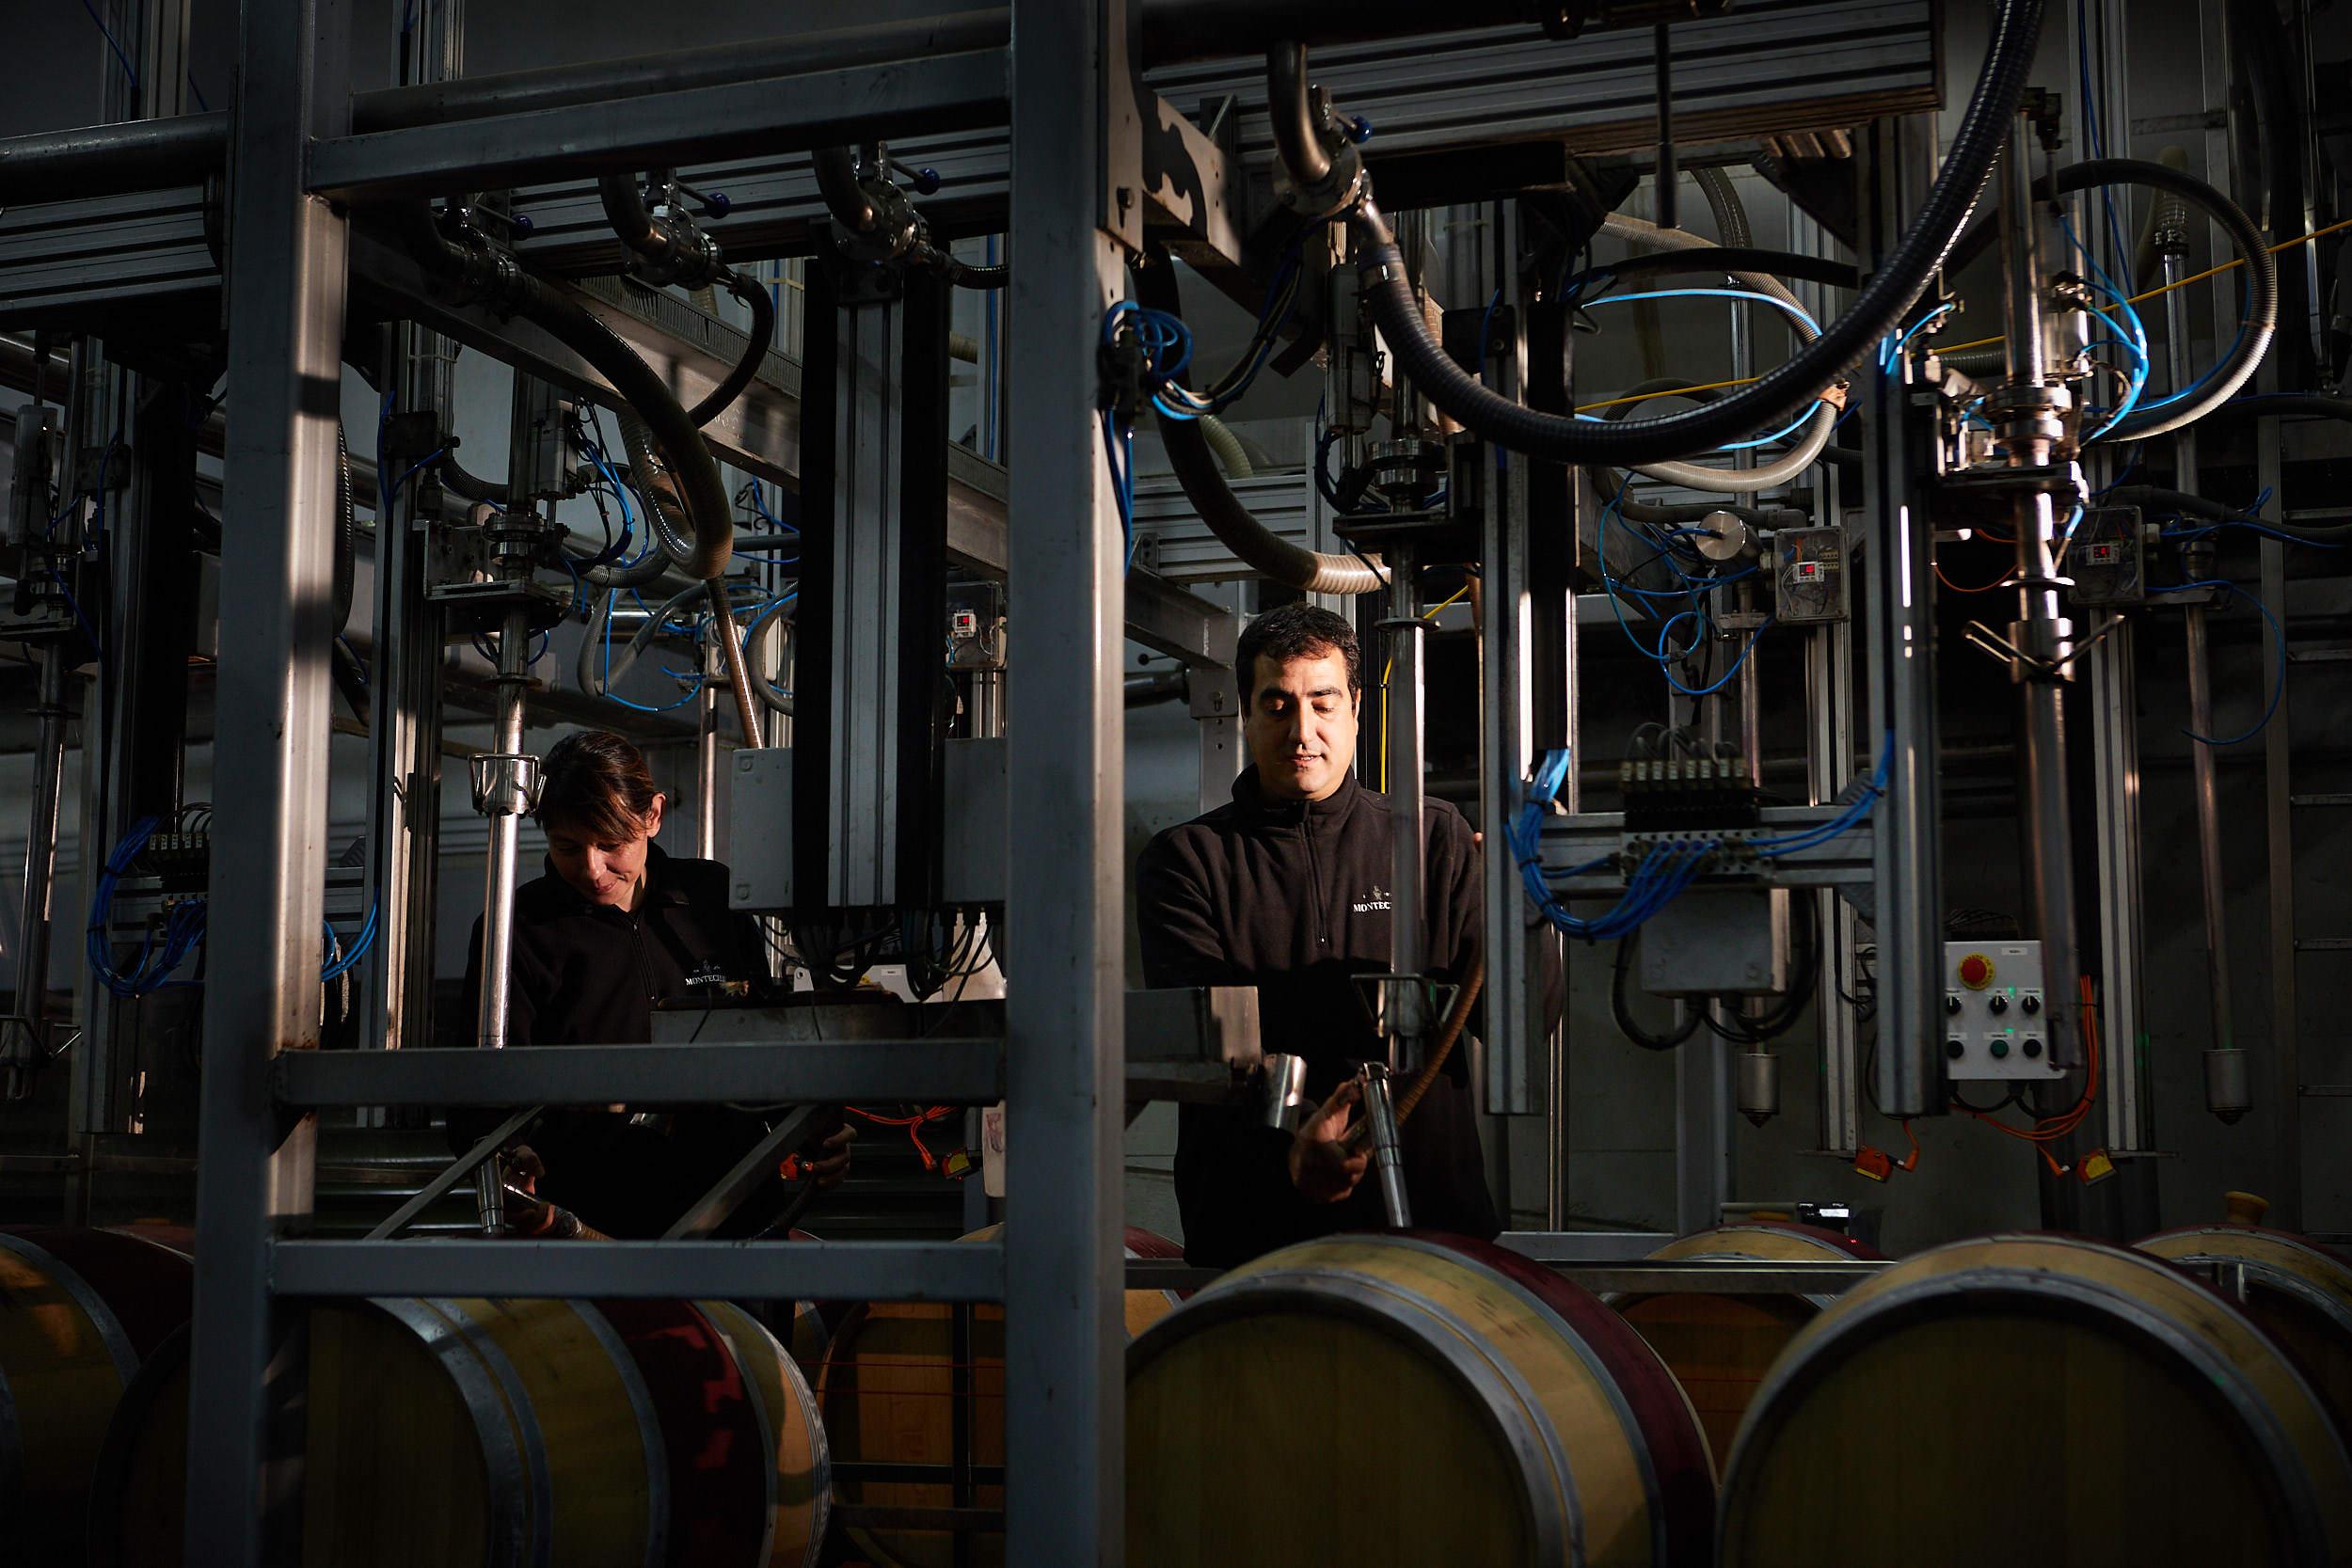 1805Basque_Country_Rioja_Spain_Corporate_Photographer_James_Sturcke_0002.jpg